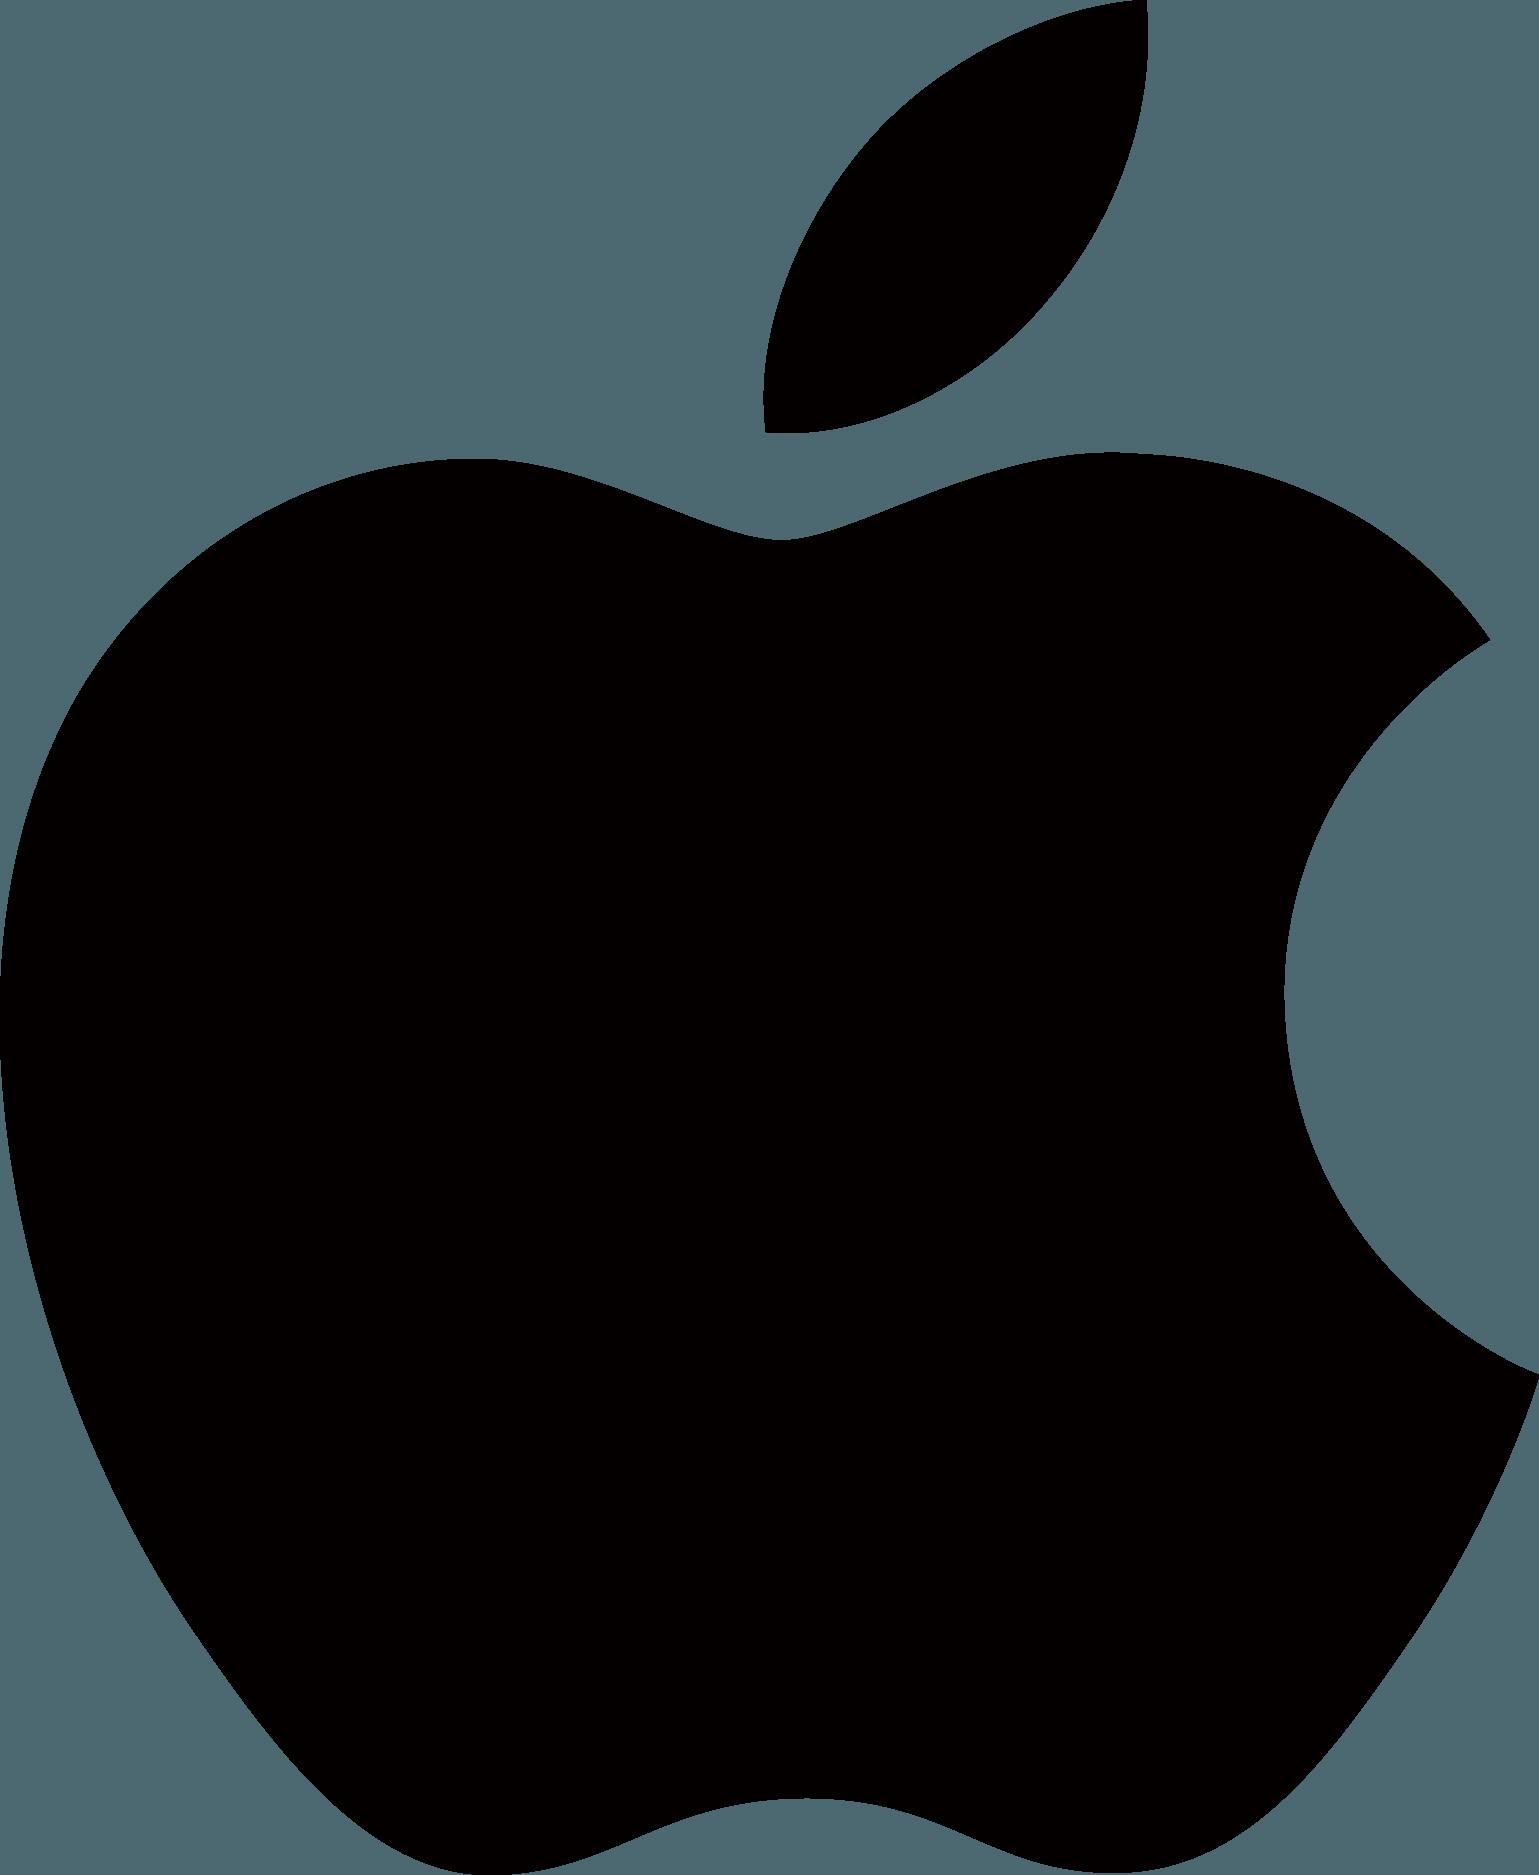 Apple Logo [Apple Computer] Vector EPS Free Download, Logo, Icons, Brand Emblems